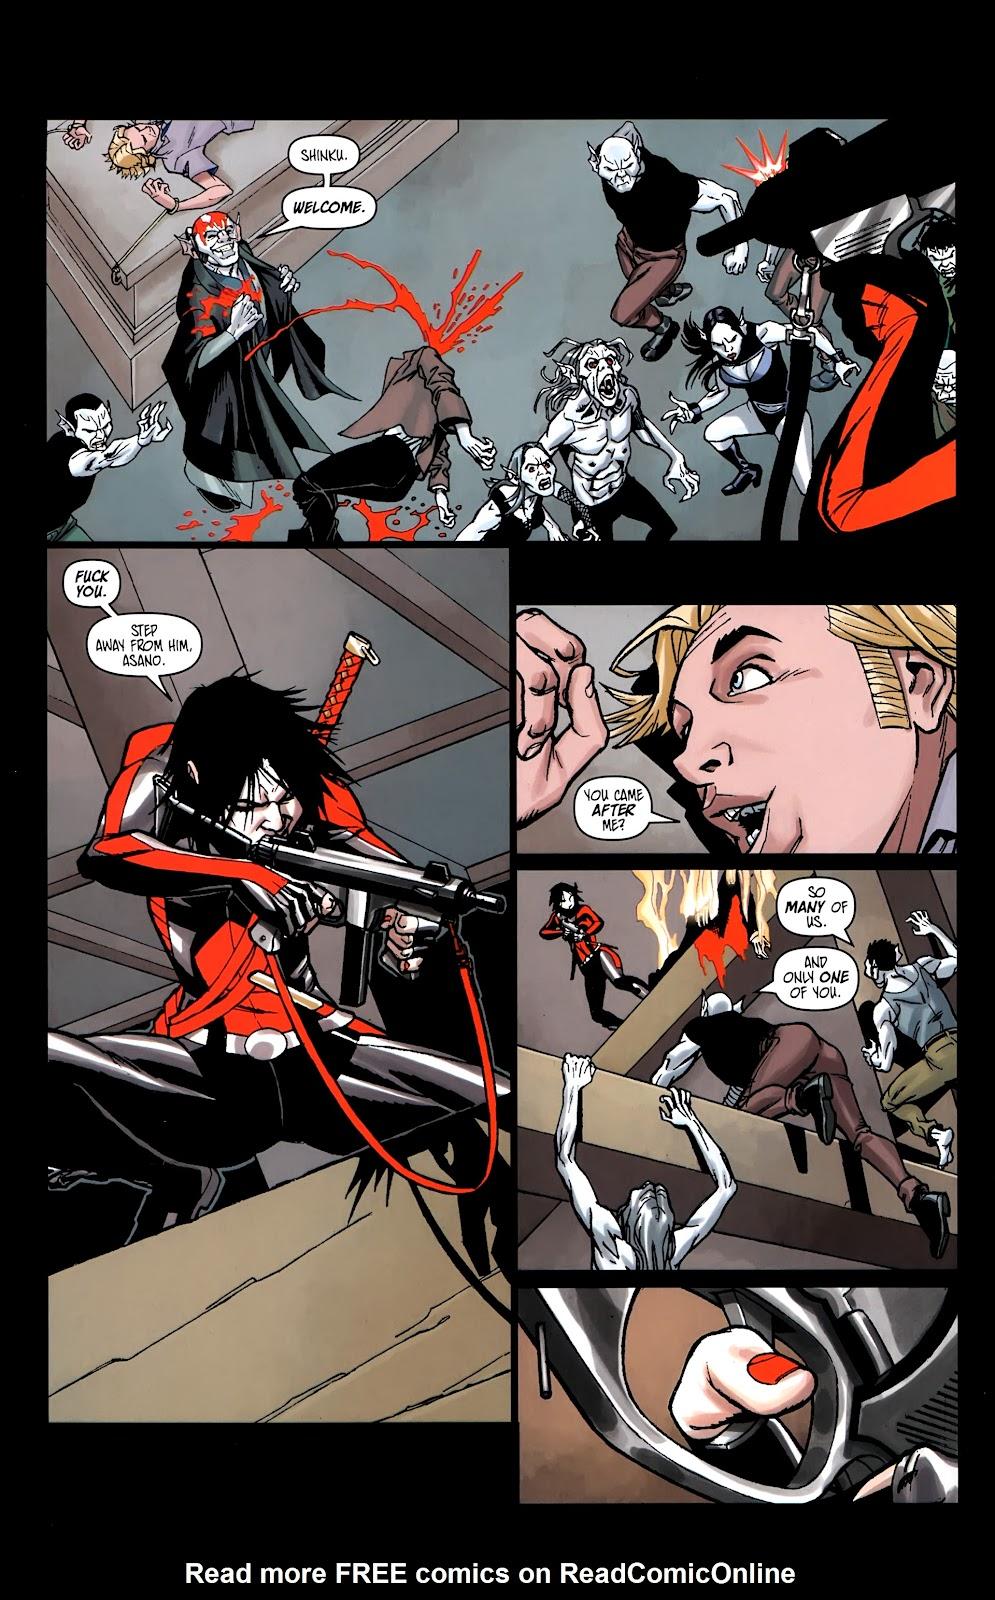 Read online Shinku comic -  Issue #5 - 13